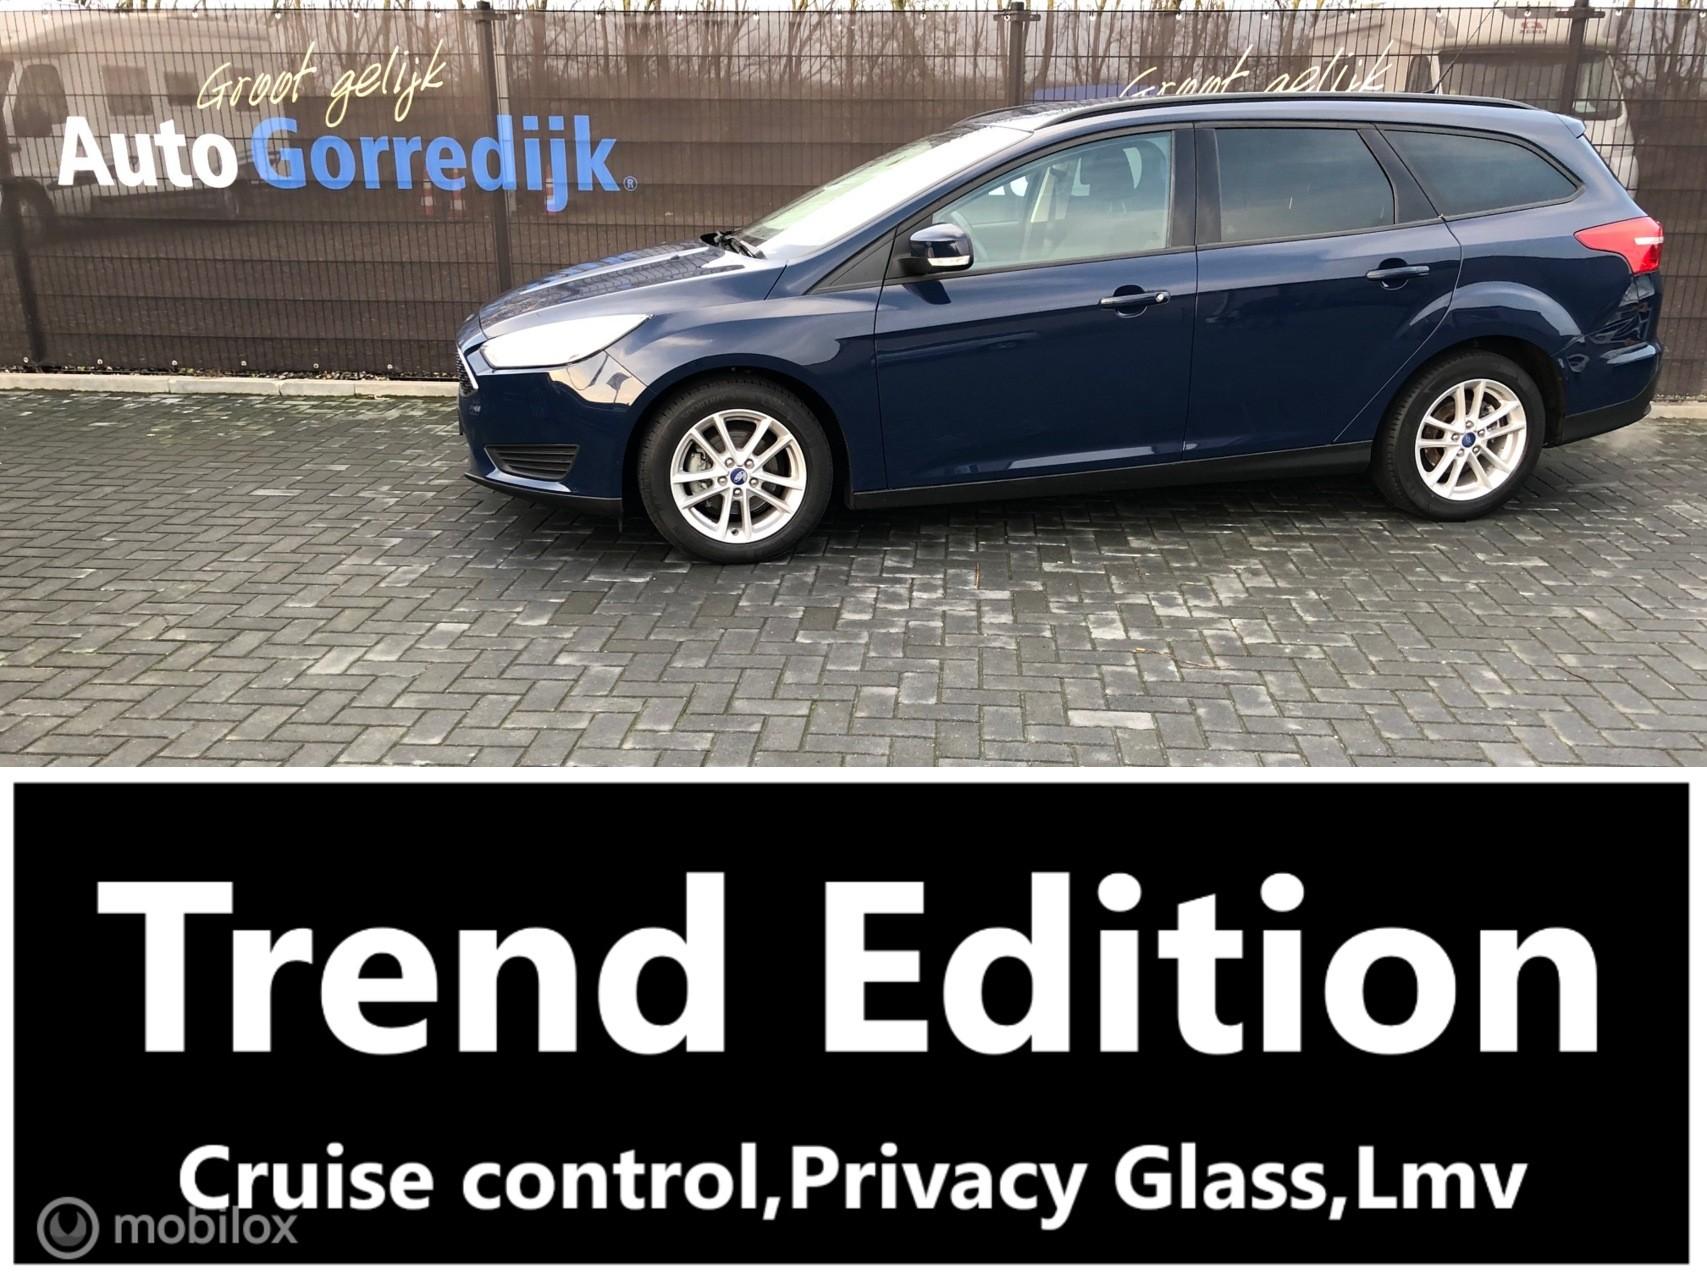 Ford Focus Wagon 100pk  Edition nieuwe model 135000 km Bj 15